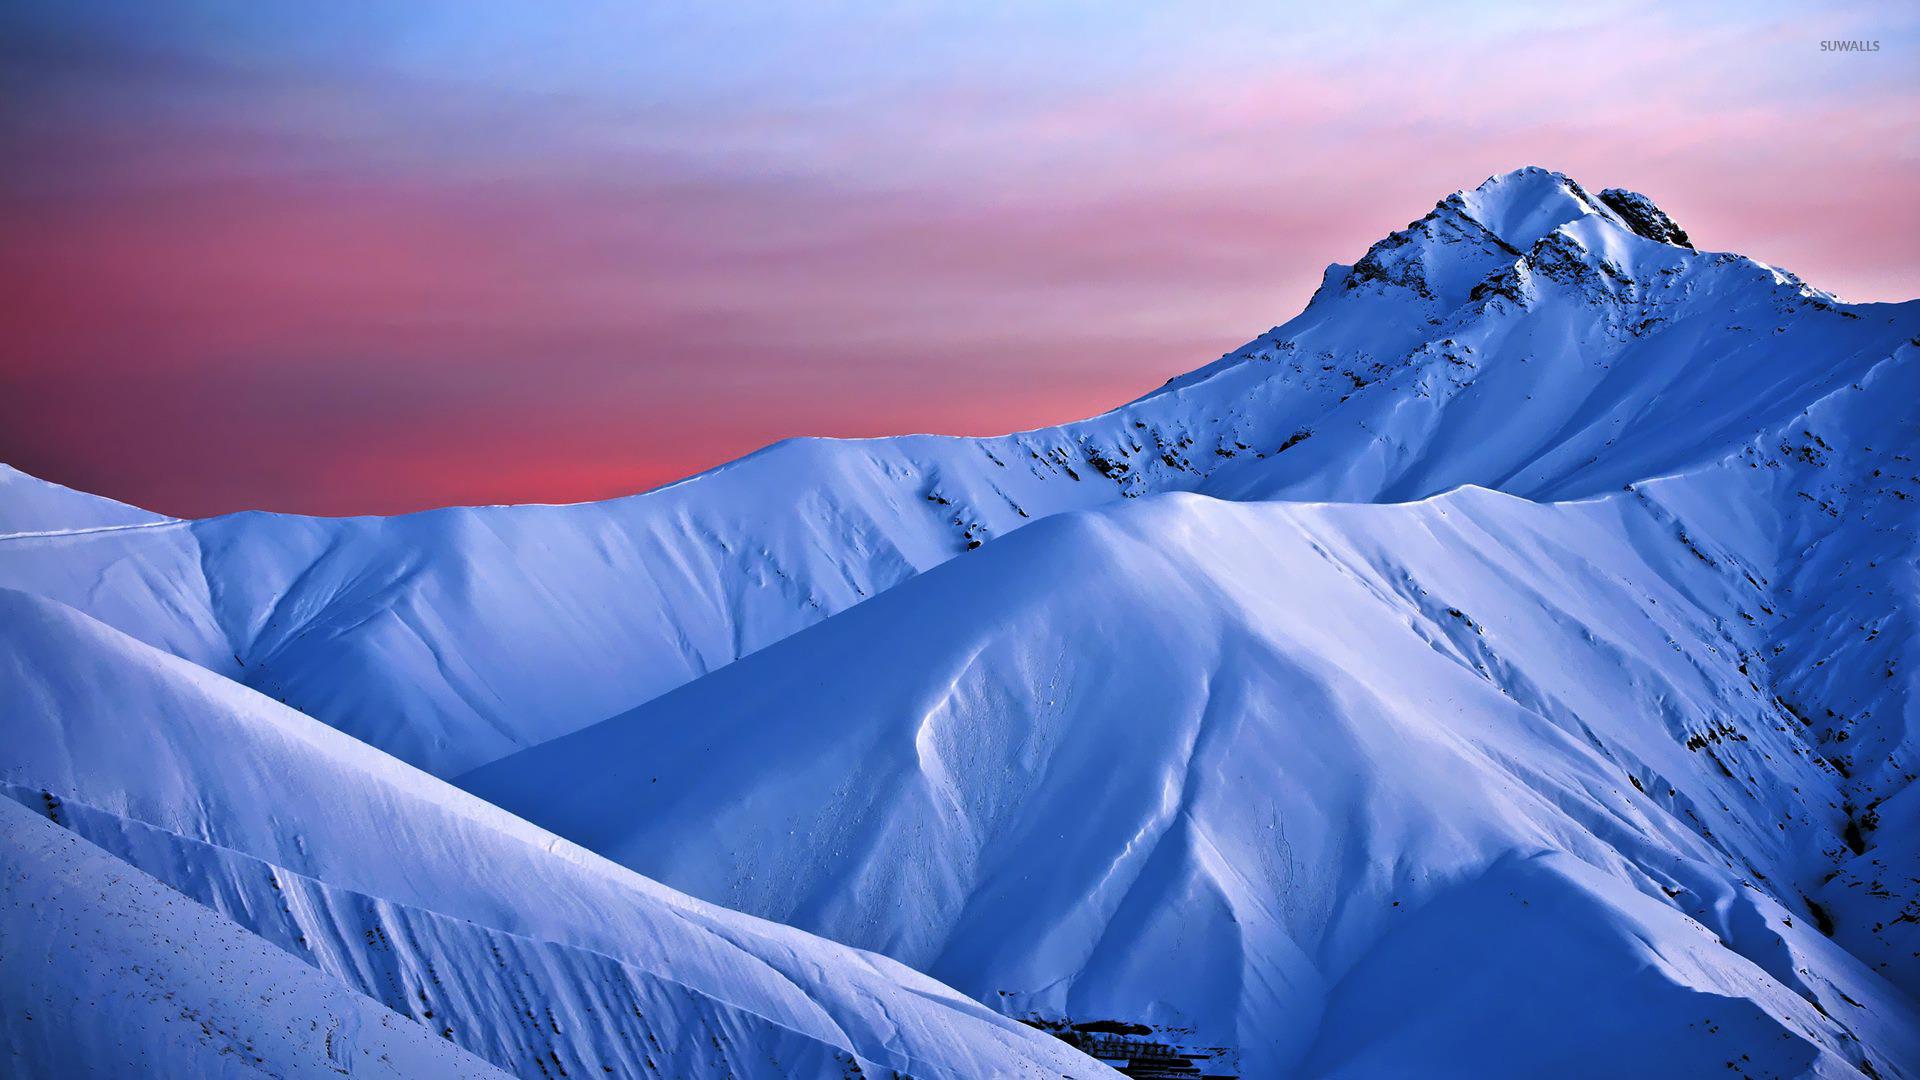 Snow Mountain Wallpapers Wallpaper